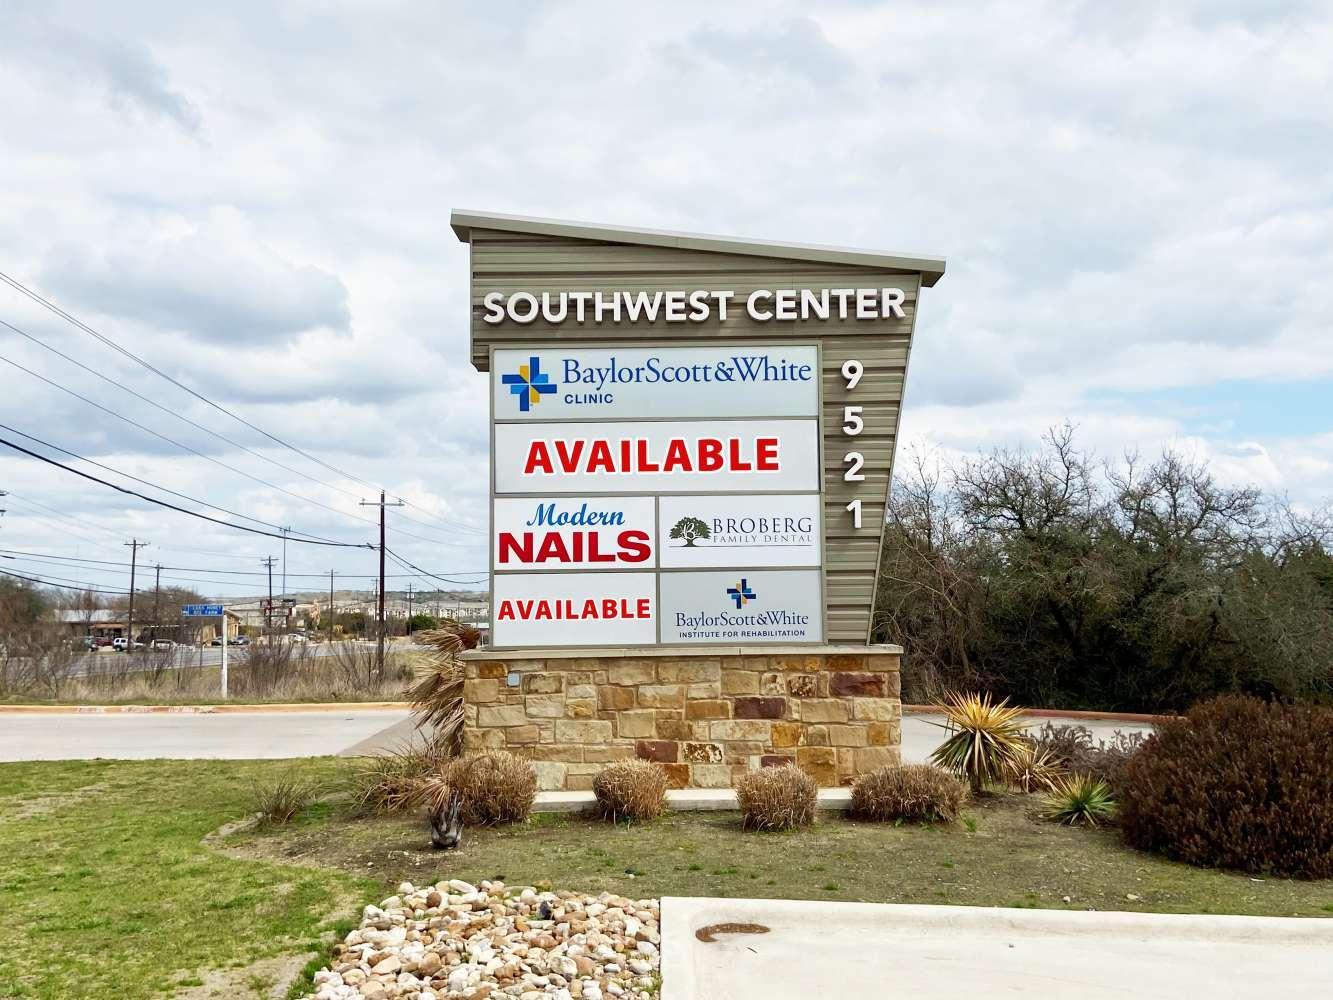 Land Austin, 78736 - Southwest Center